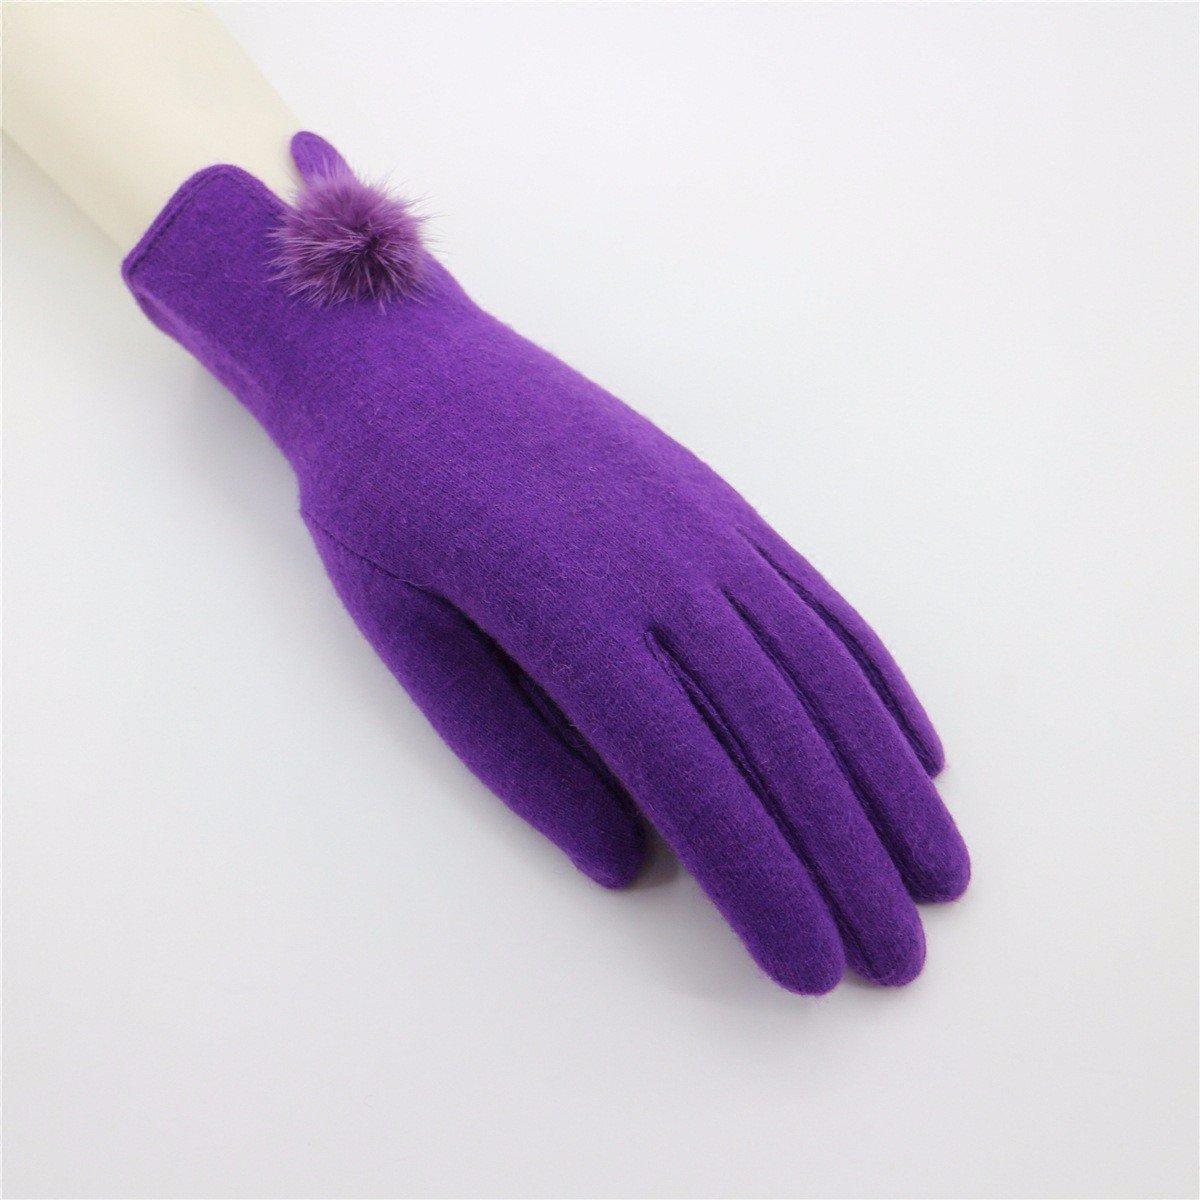 DIDIDD Señoras guantes ciclismo guantes toque guantes,Violeta,F